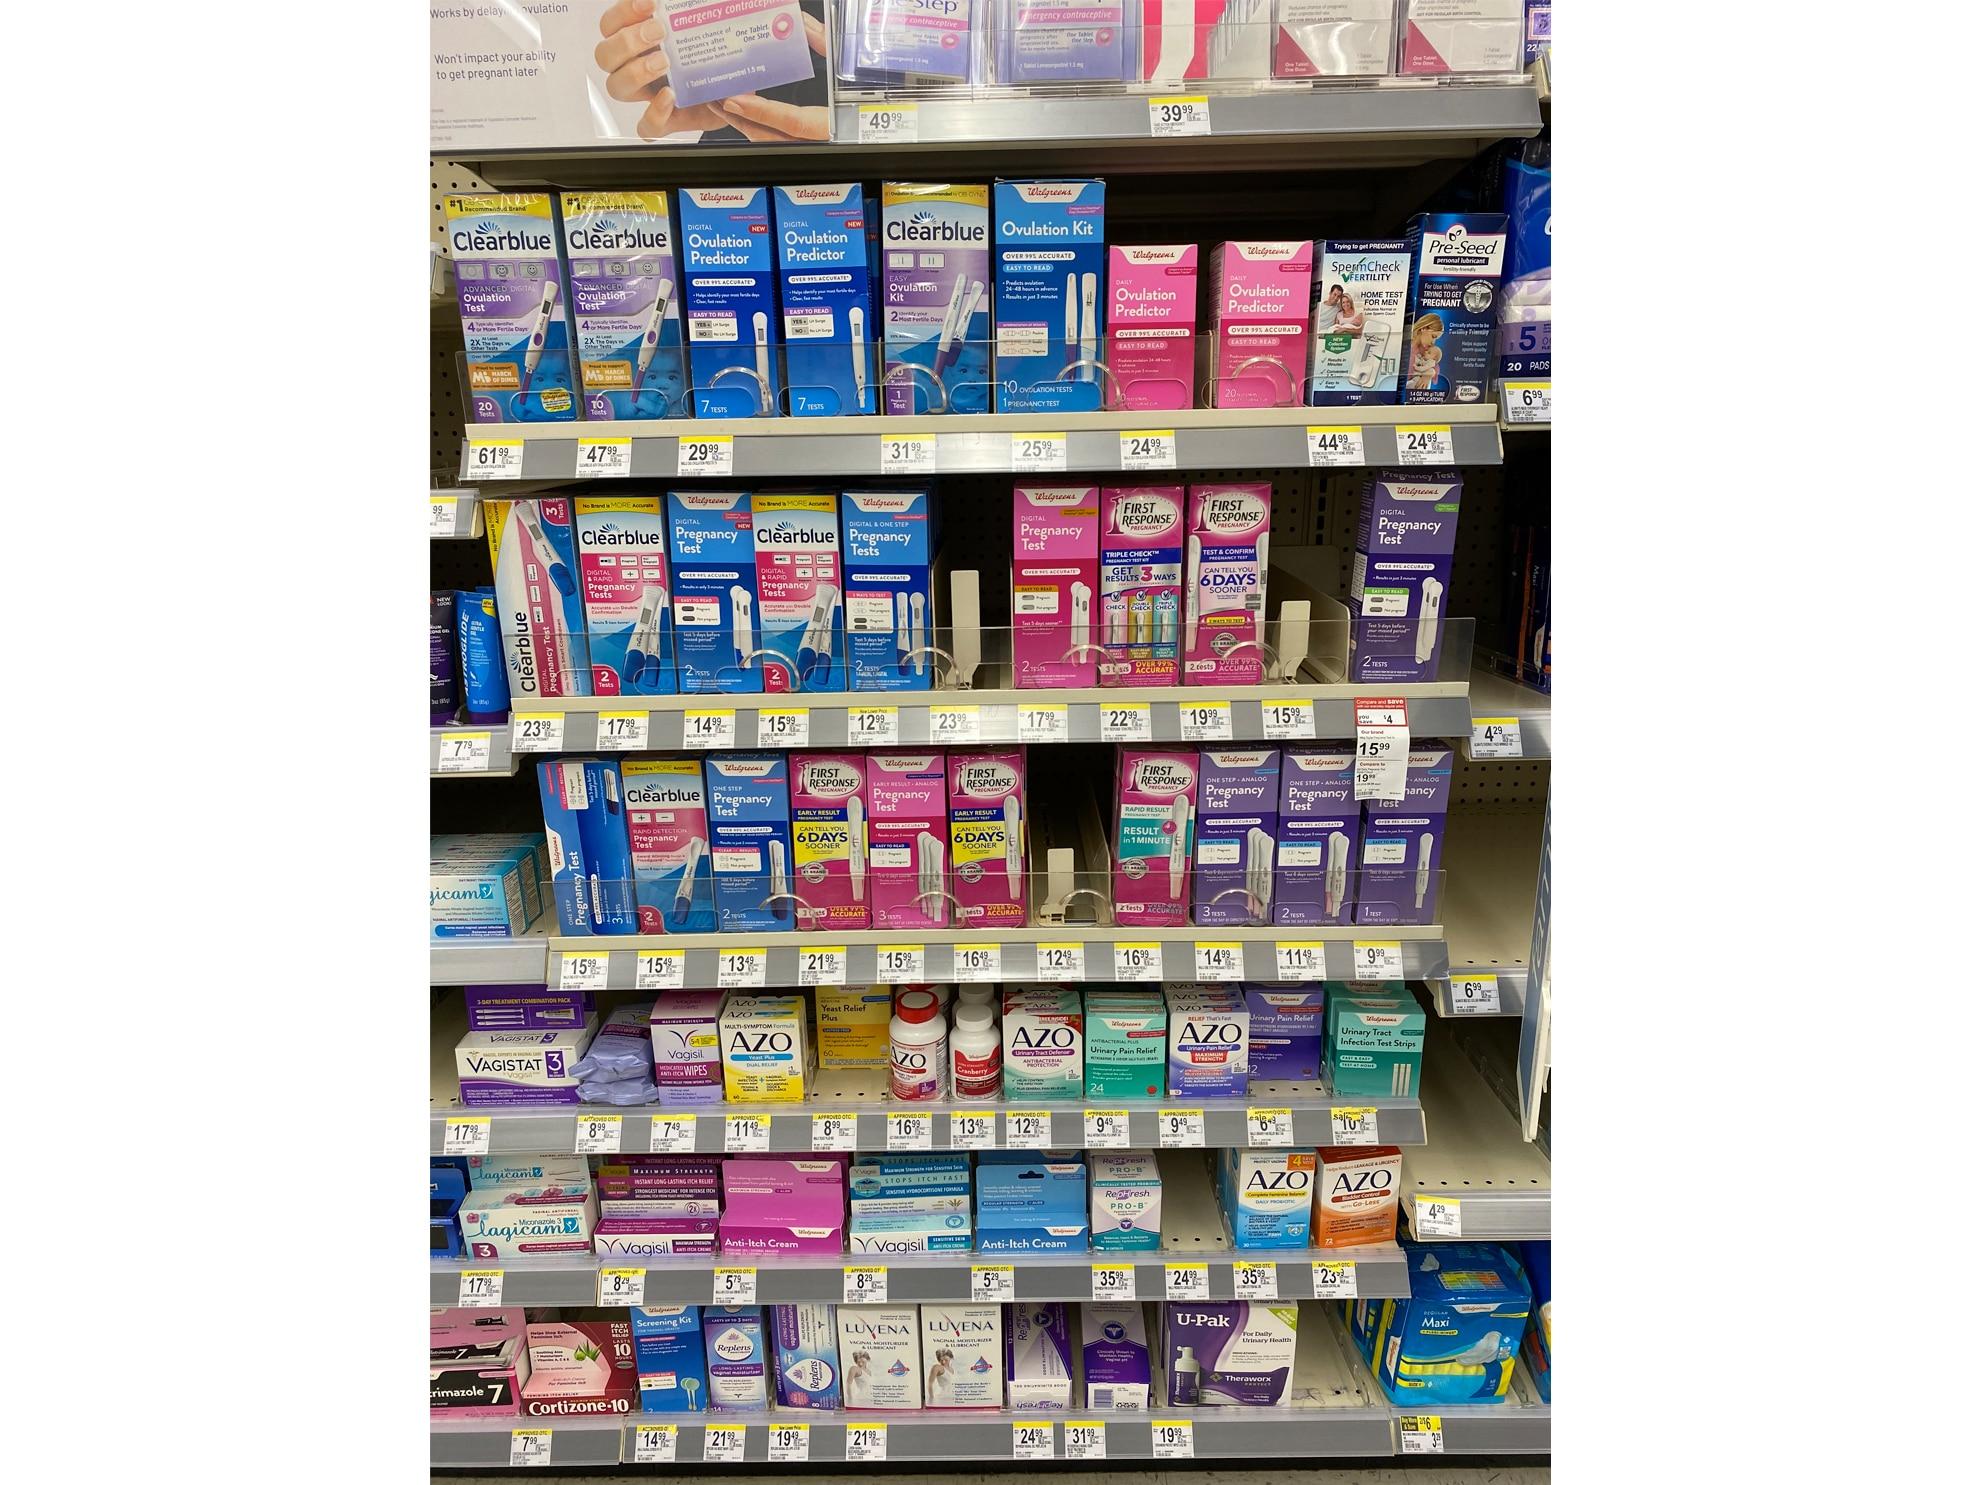 Walgreens Pregnancy Test